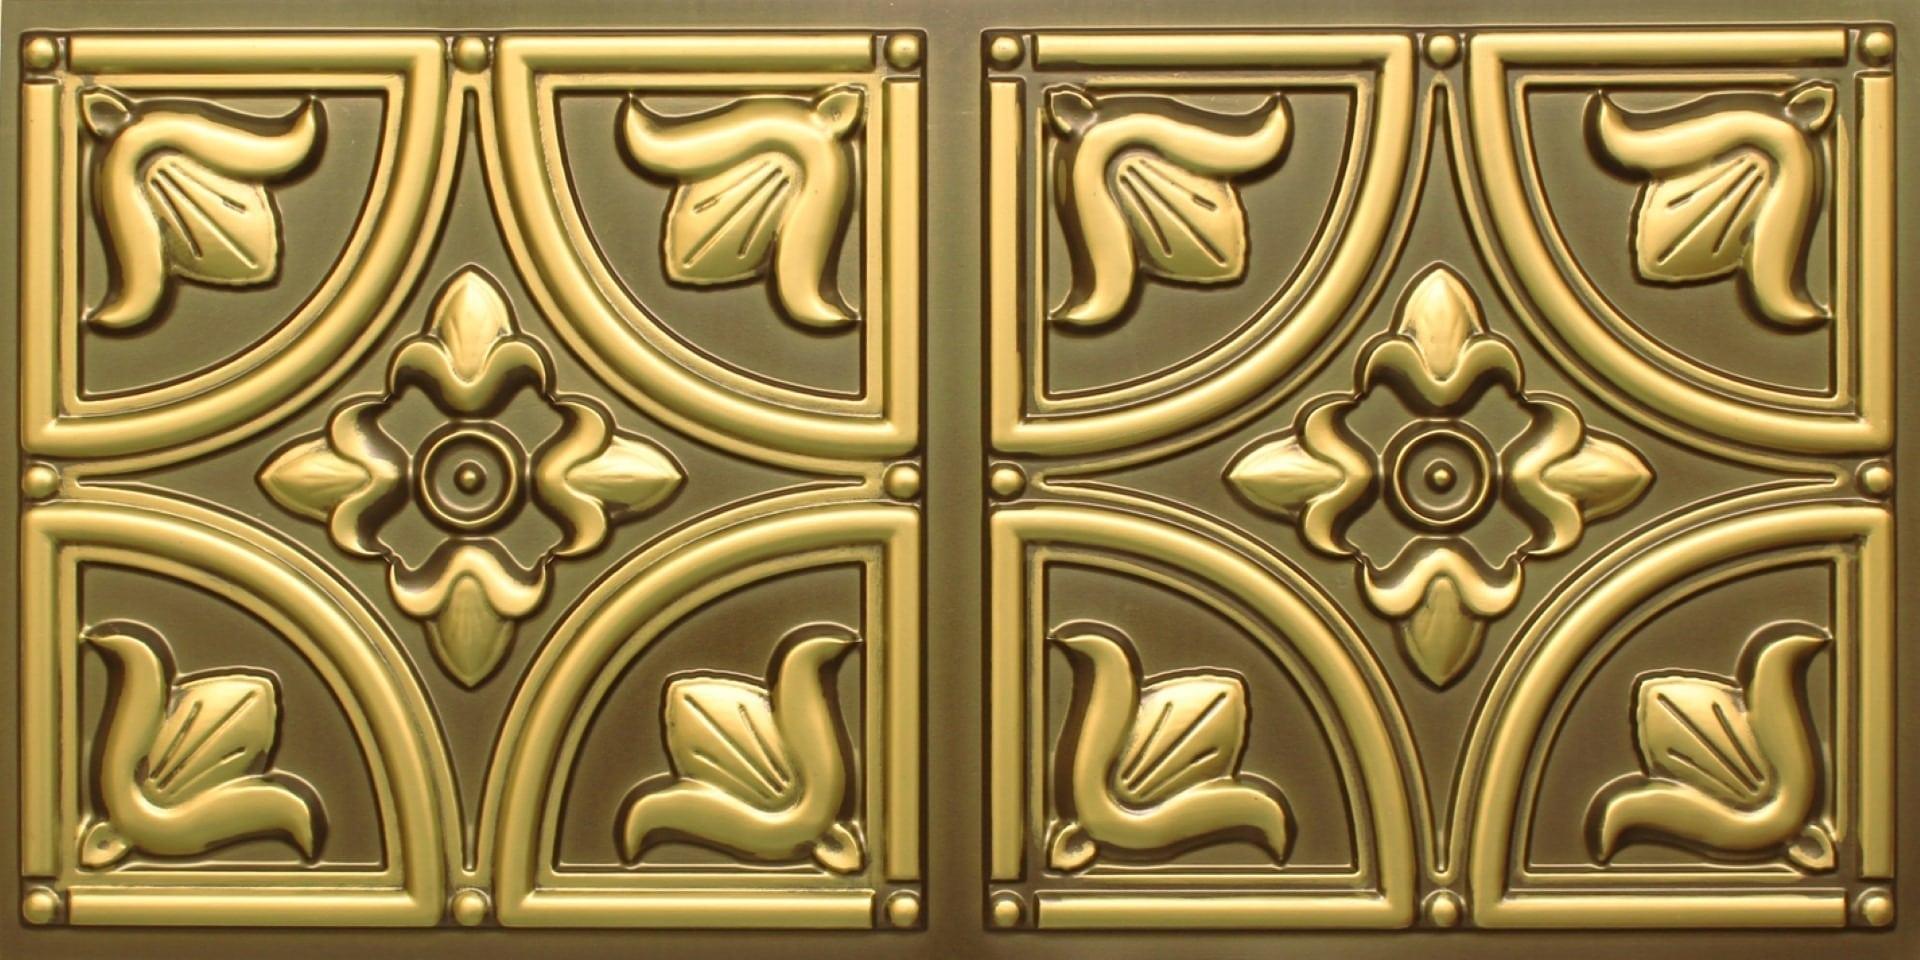 8273 Faux Tin Ceiling Tile - Talissa Decor - Ceiling Tiles